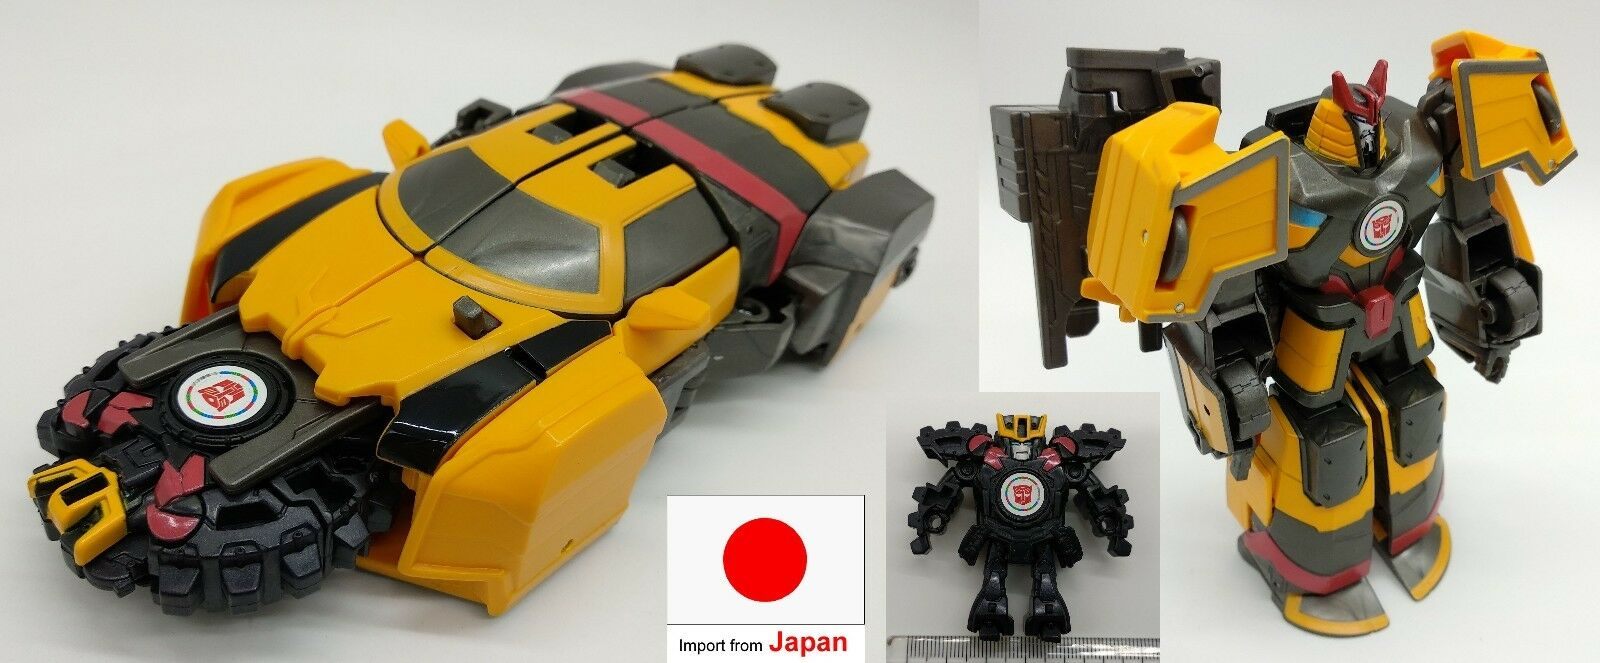 Japan import transformers toy robot Autobot MICRONSHOOTER DRIFT SET anime tw